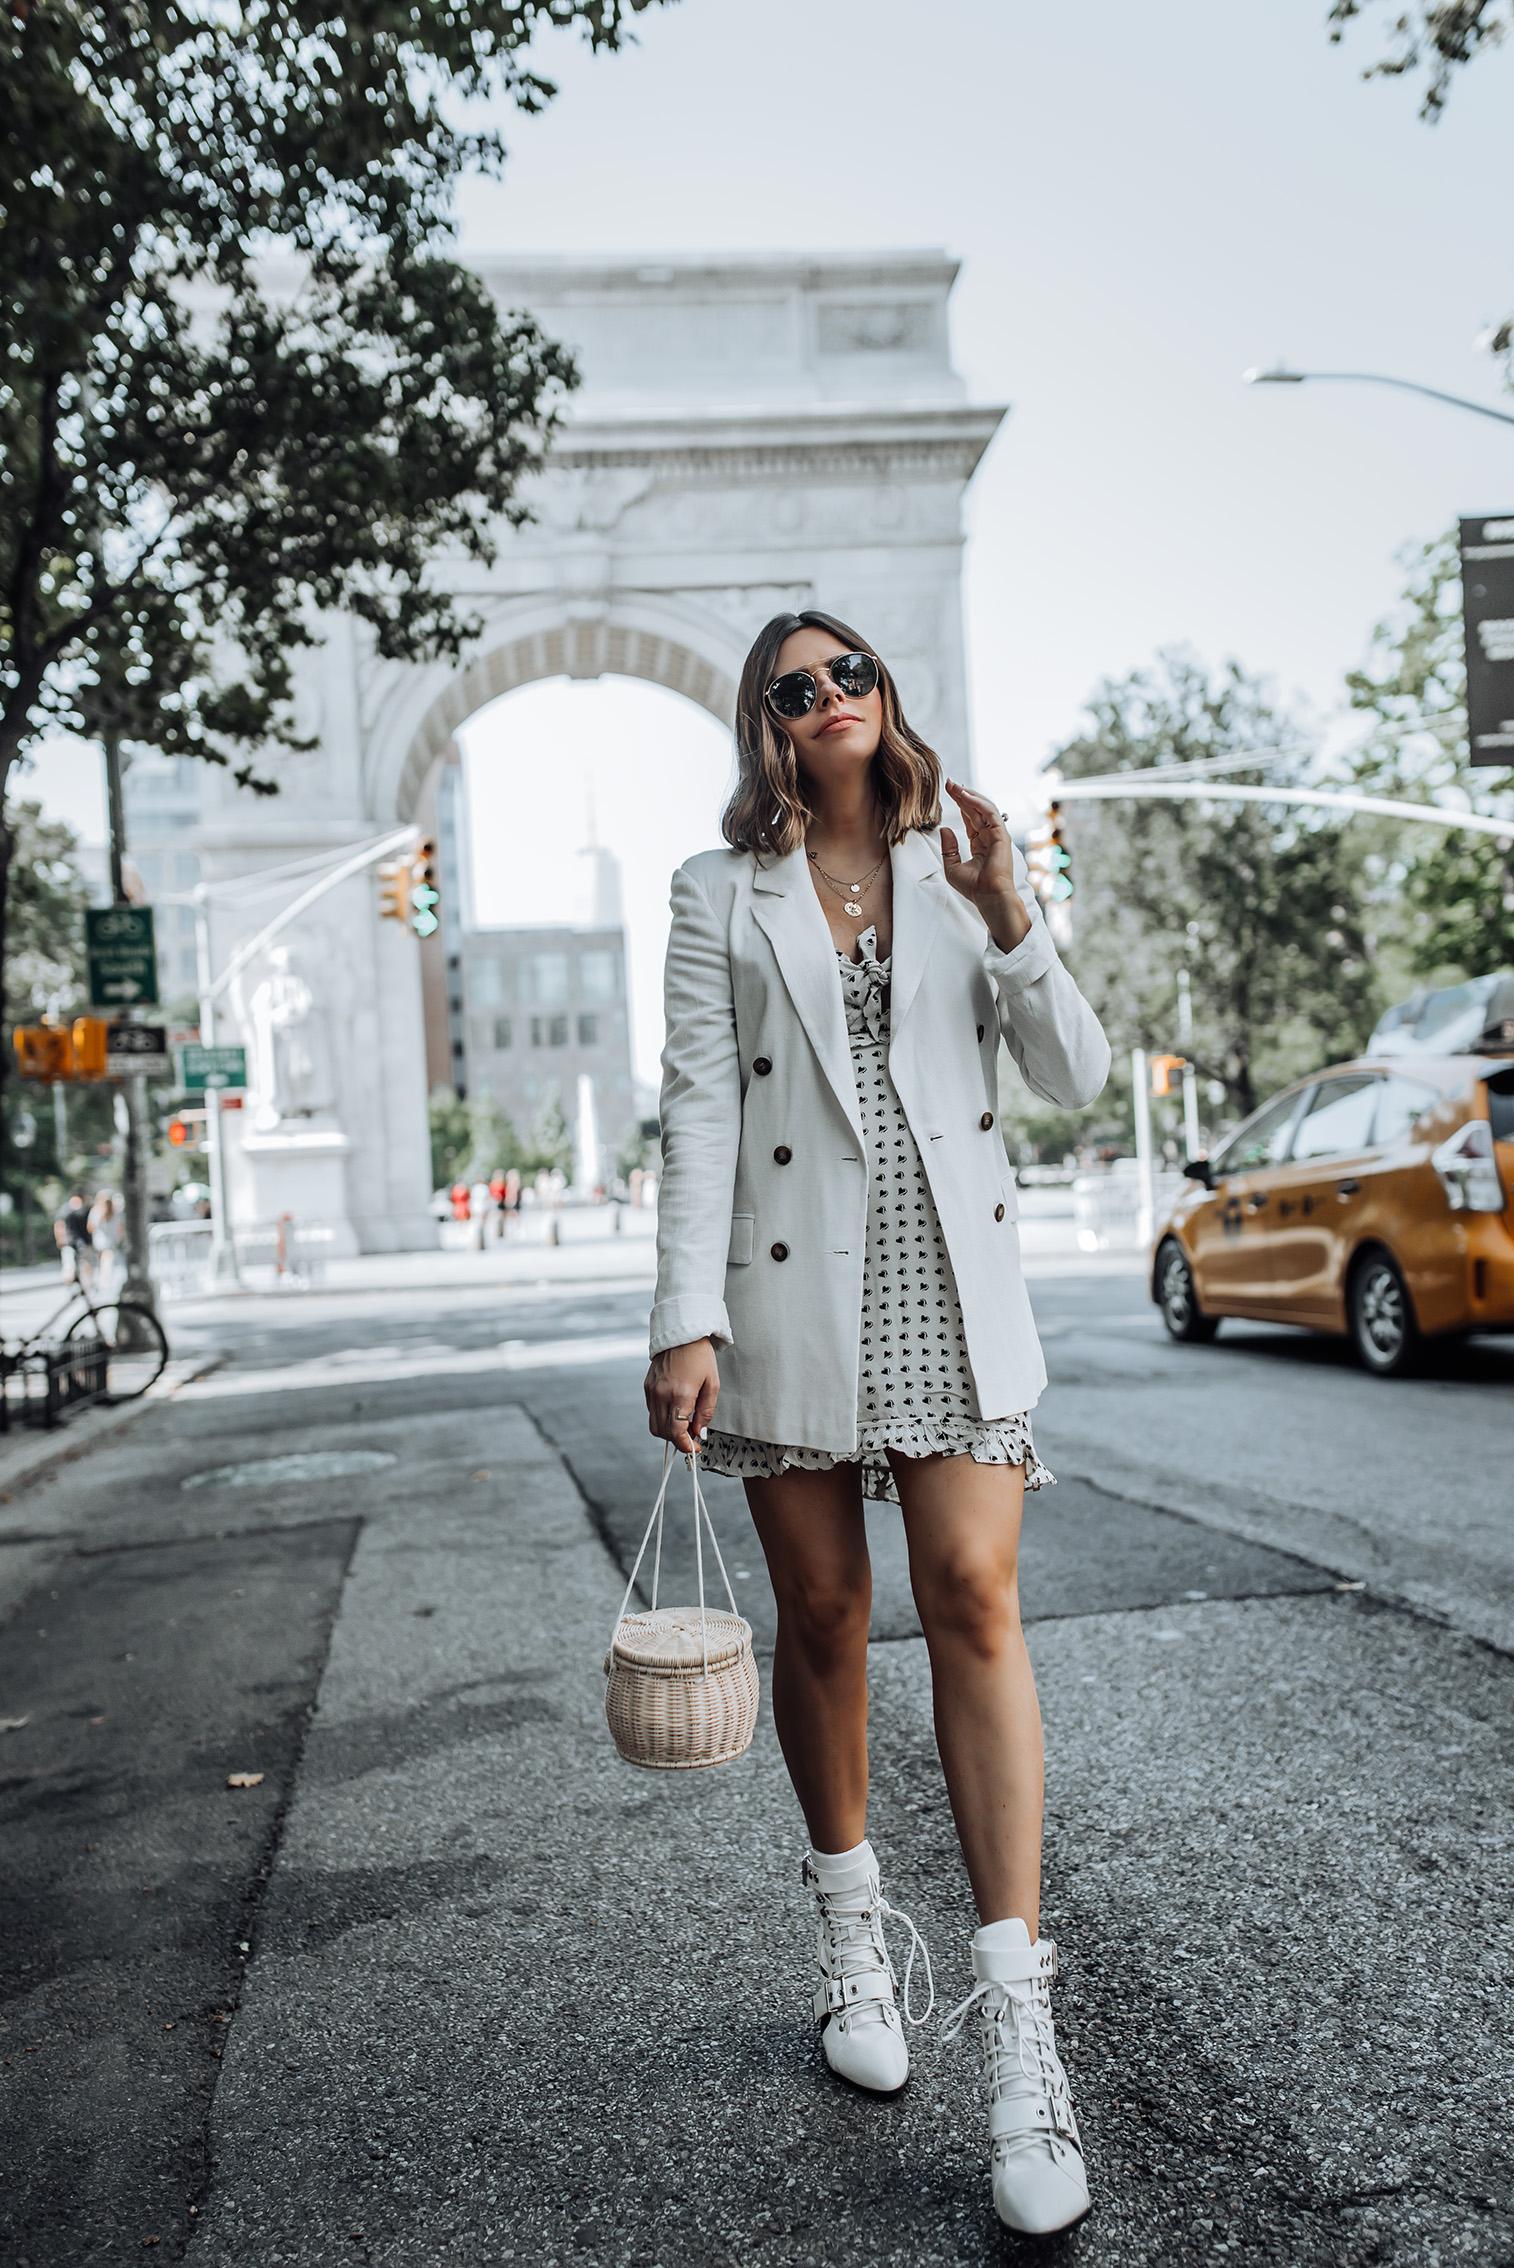 For Love & Lemons Sweetheart Mini Dress   Linen Blazer   ZARA Handbag   Leather Booties #liketkit #blazeroutfits #zara #streetstyle